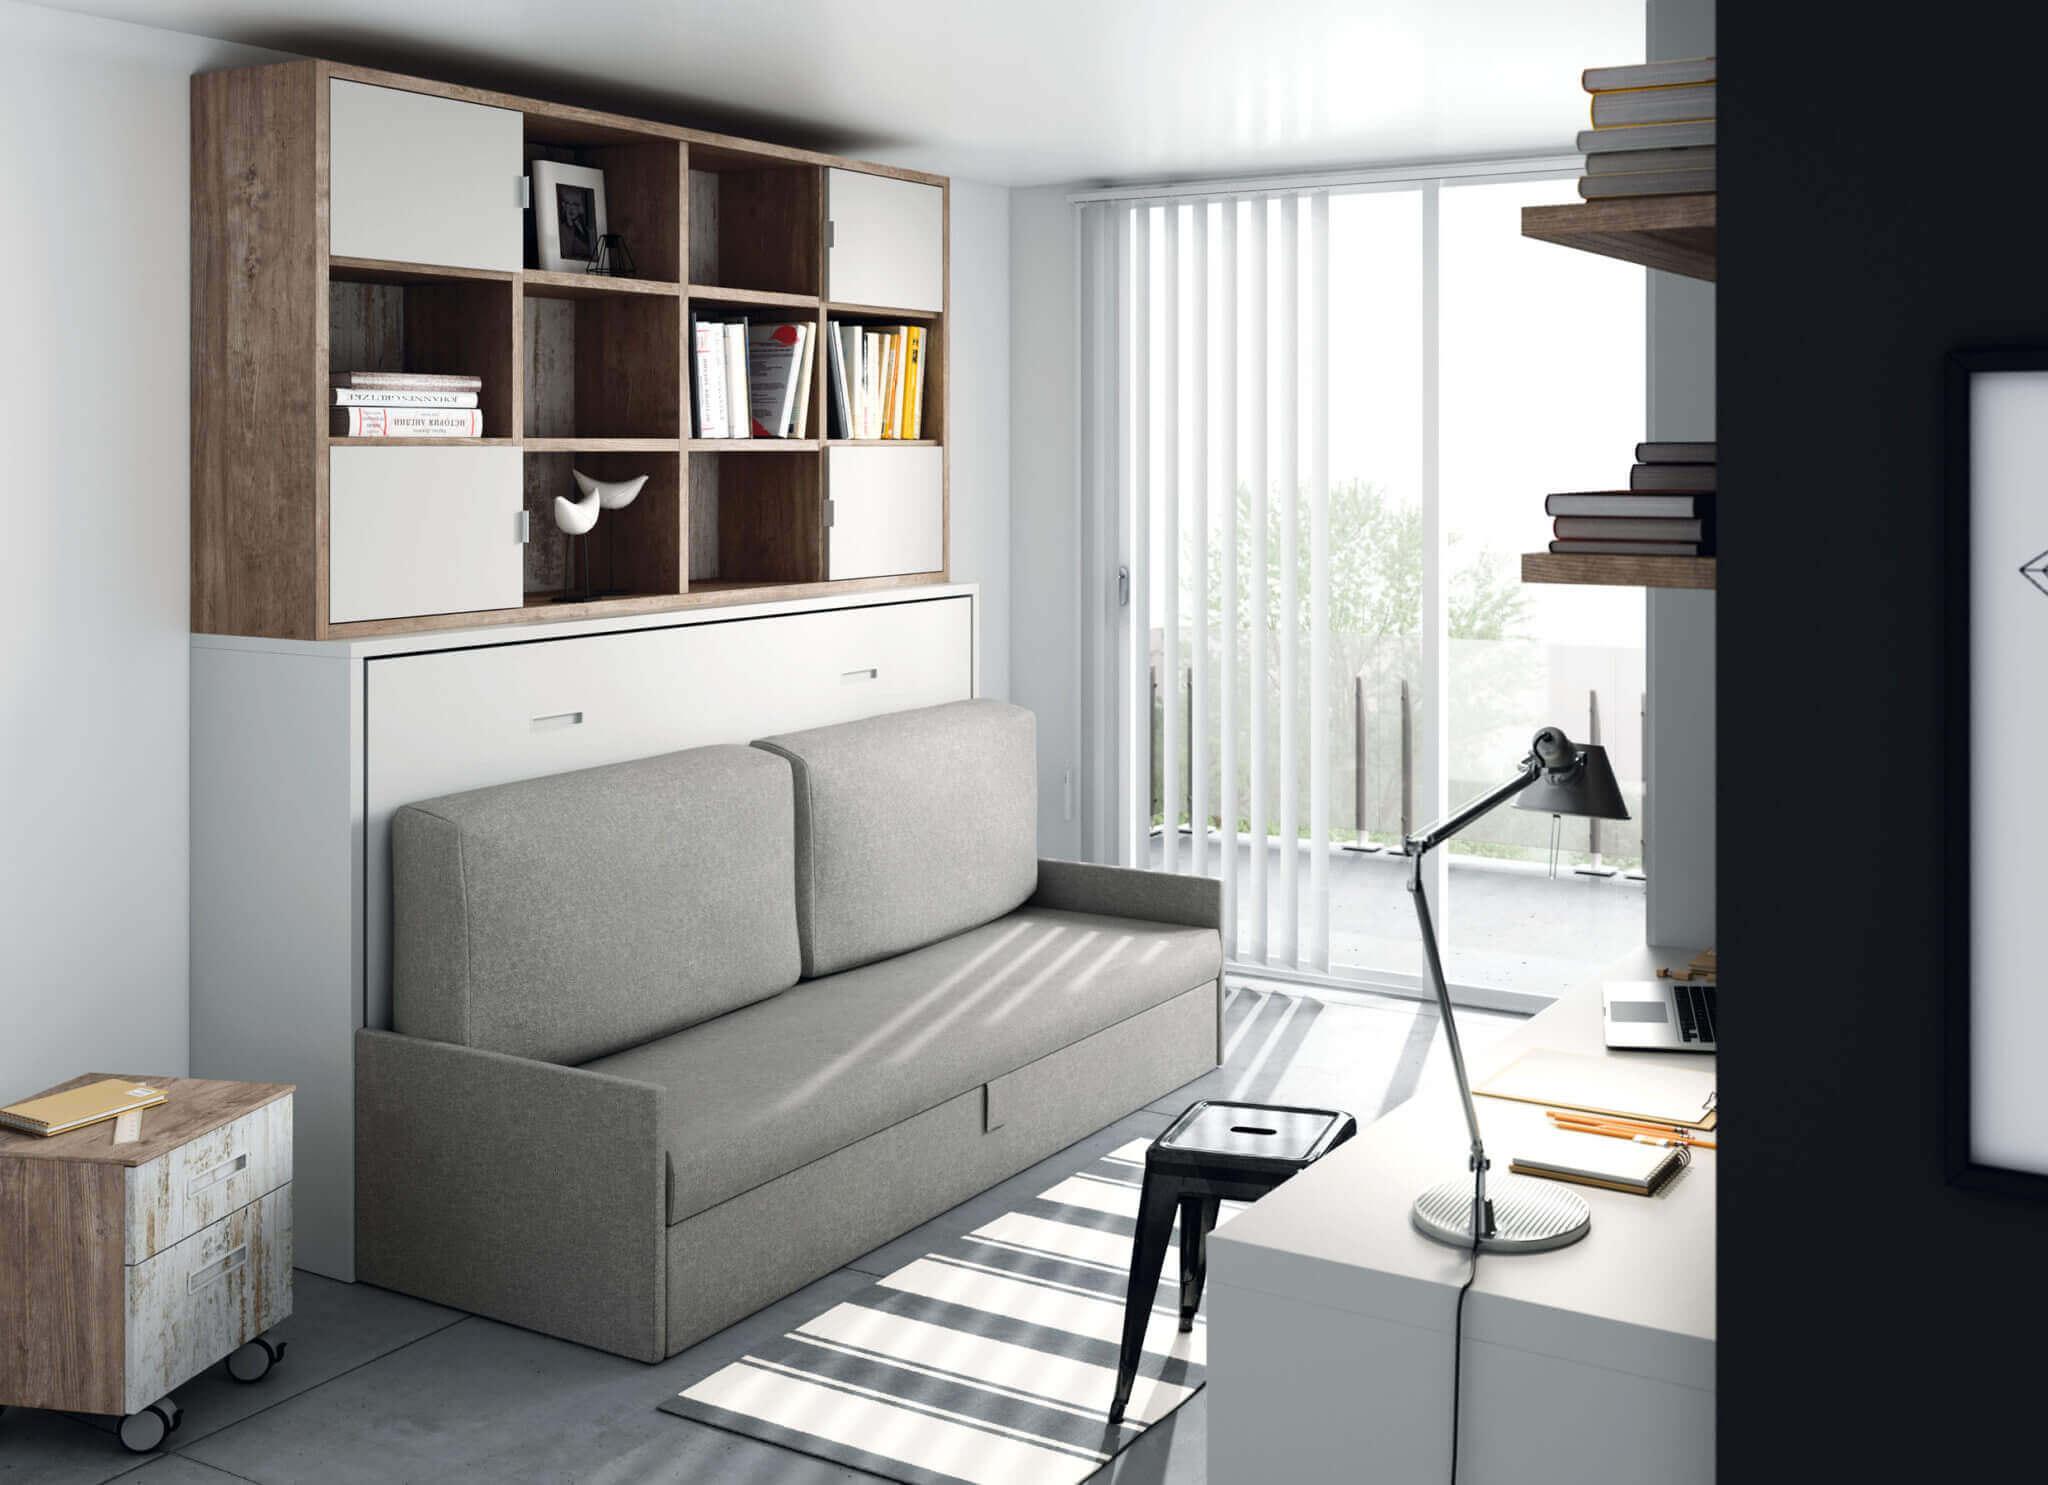 Camas abatibles horizontales con sofa camas abatibles for Sofa cama para habitacion juvenil